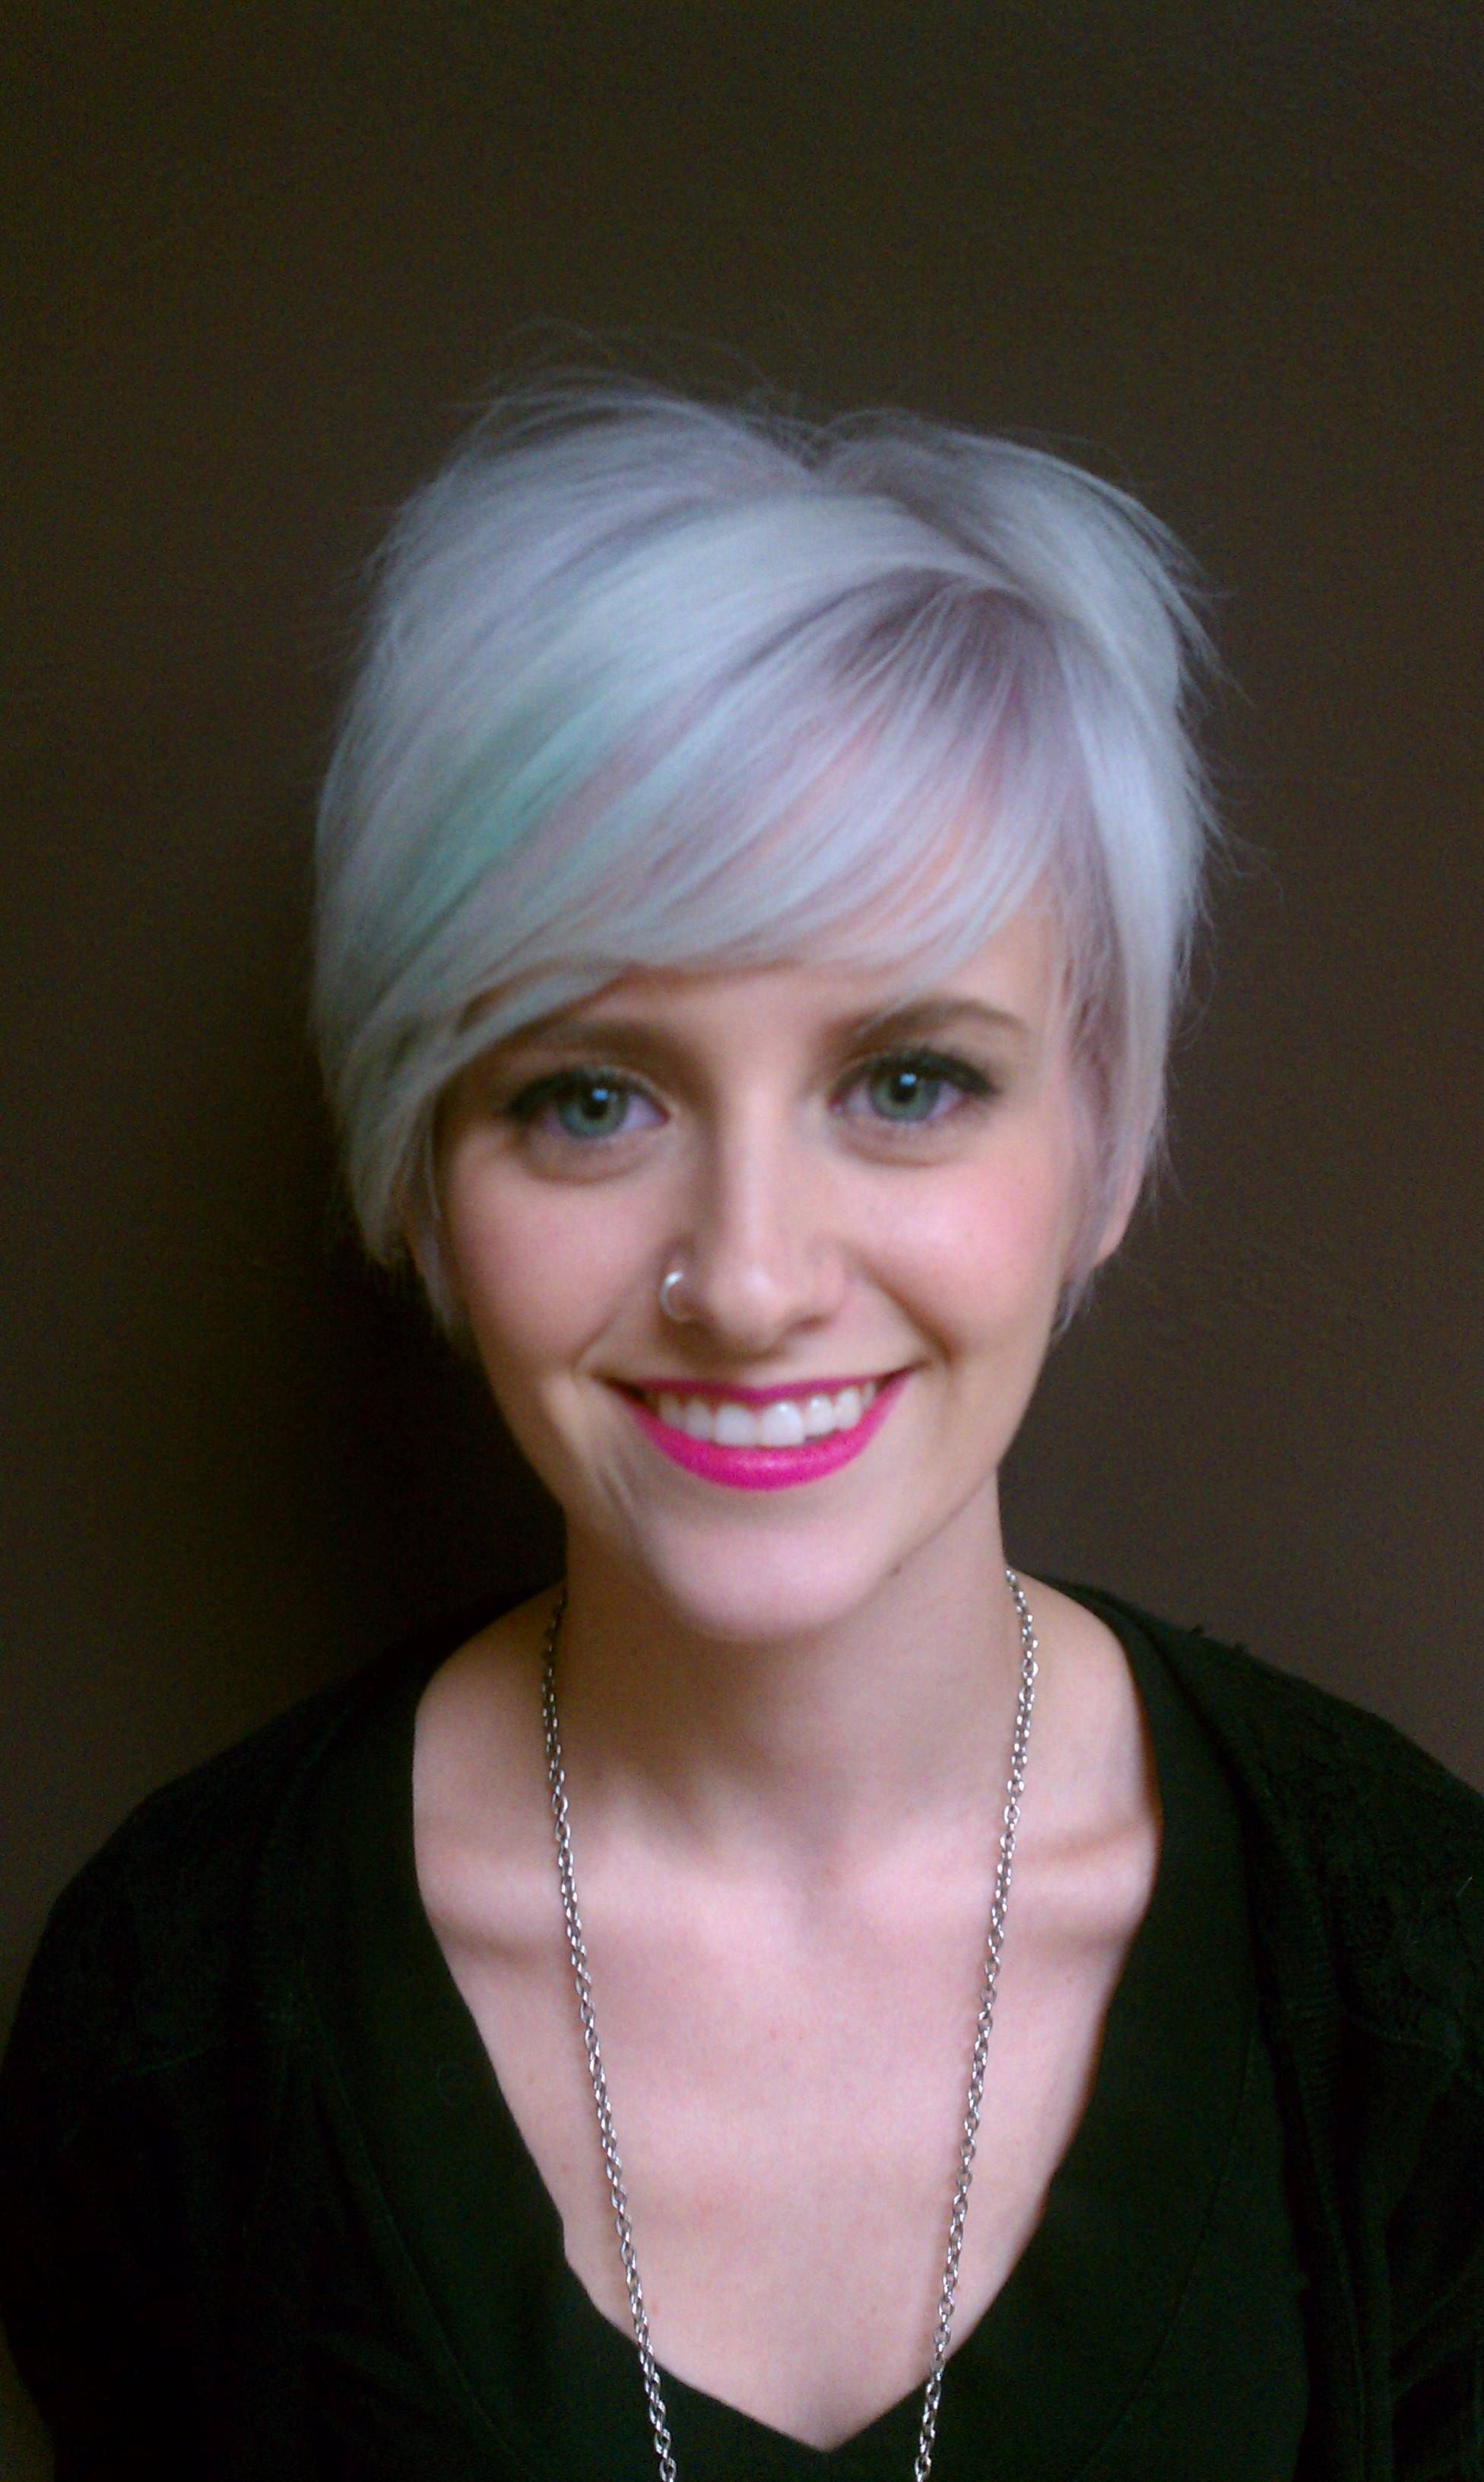 pastel, aqua, violet, platinum, lilac, blue, pink lips, blonde